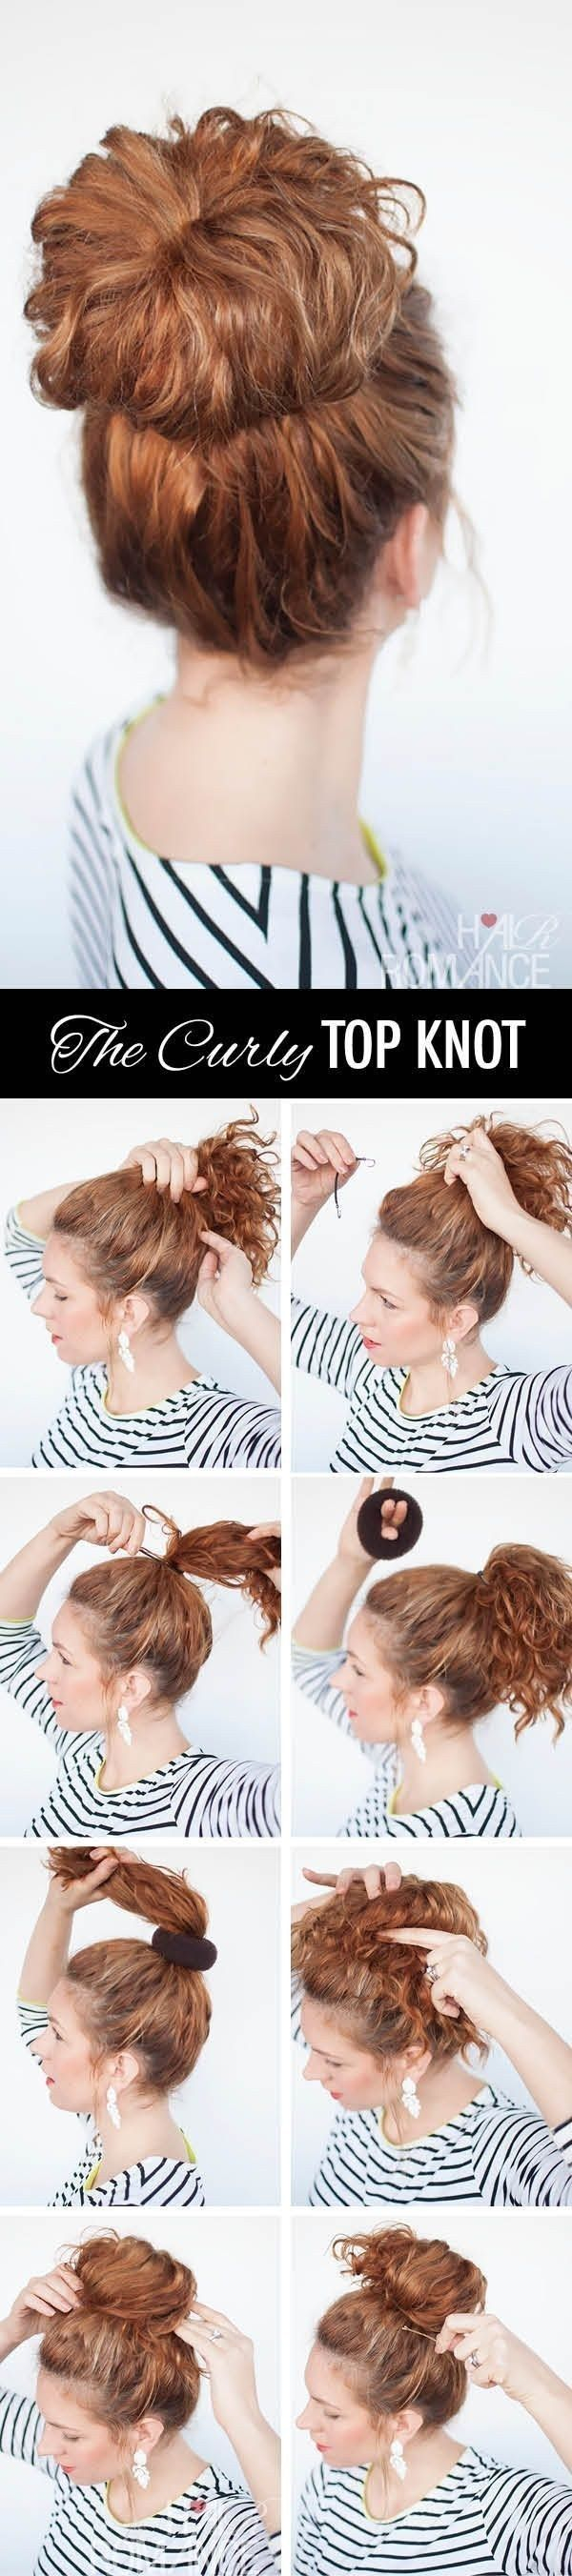 Fabulous 1000 Ideas About Interview Hairstyles On Pinterest Job Short Hairstyles Gunalazisus